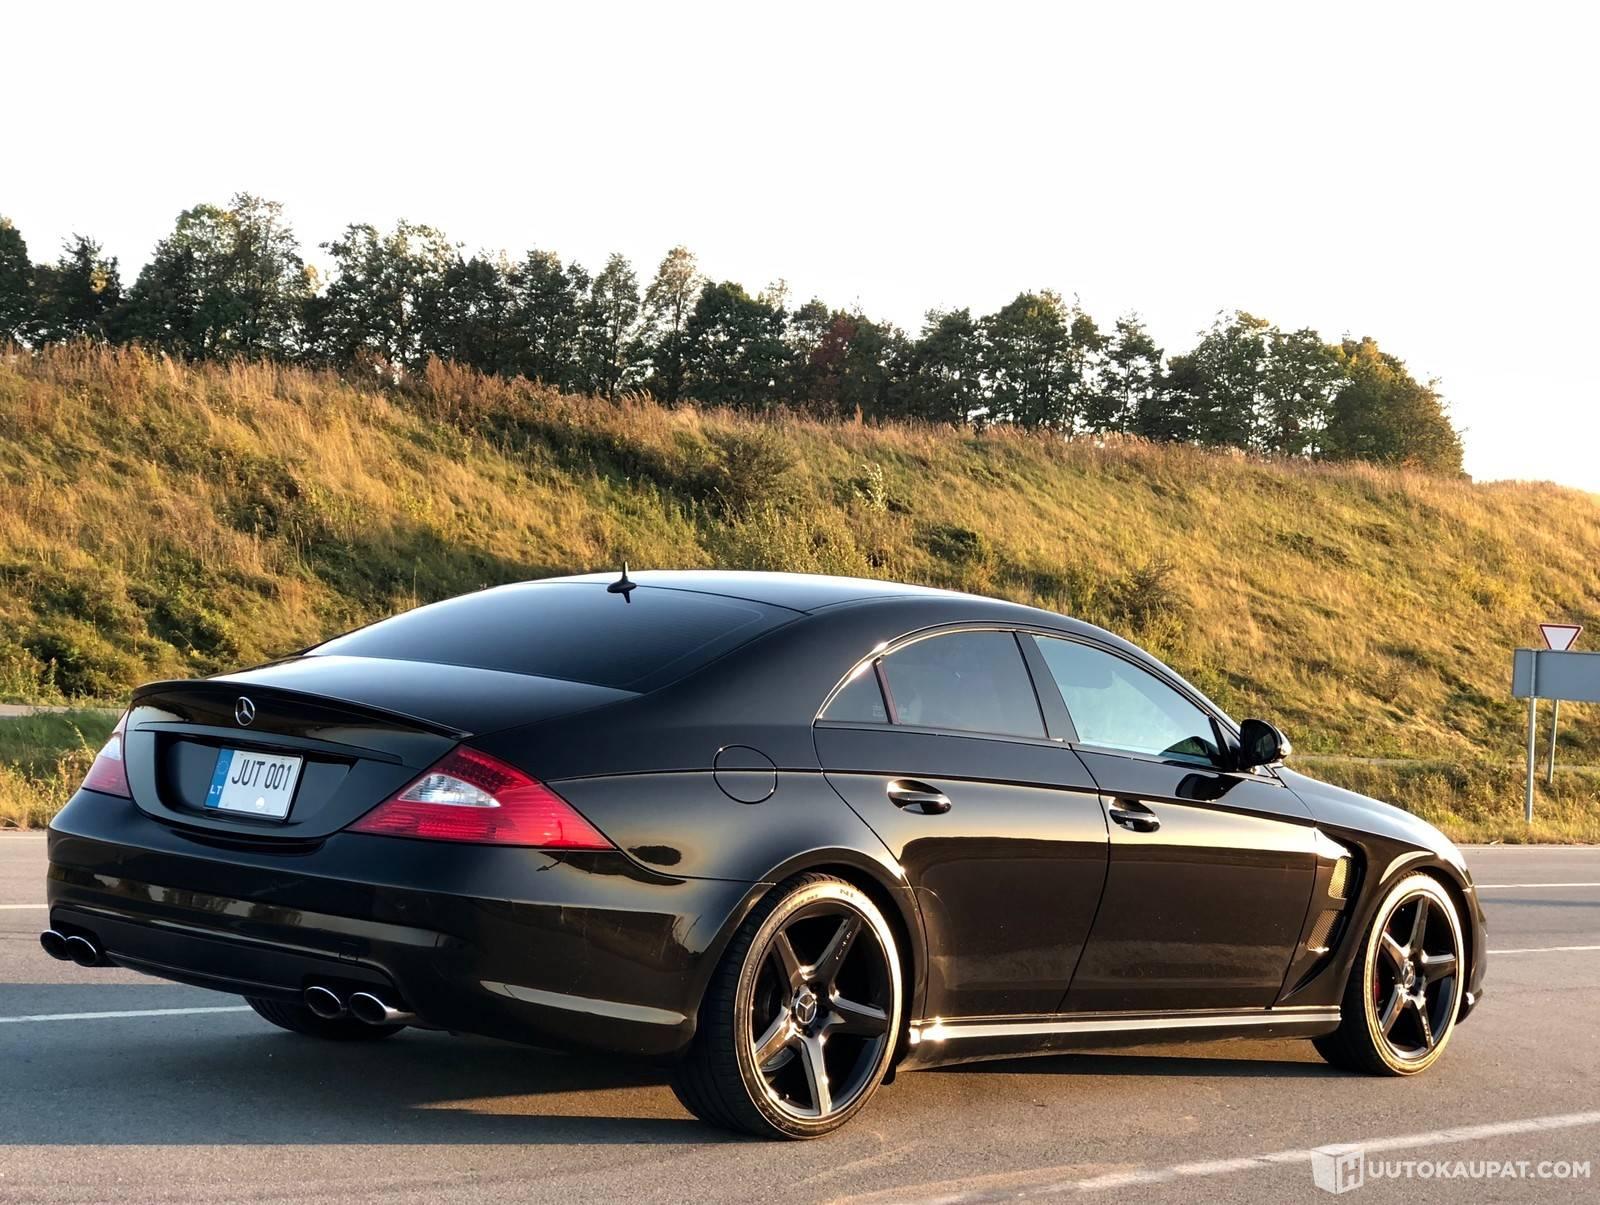 Mercedes Benz CLS 55 AMG 500hv V8 Remmiahdettu Blackline TAX FREE